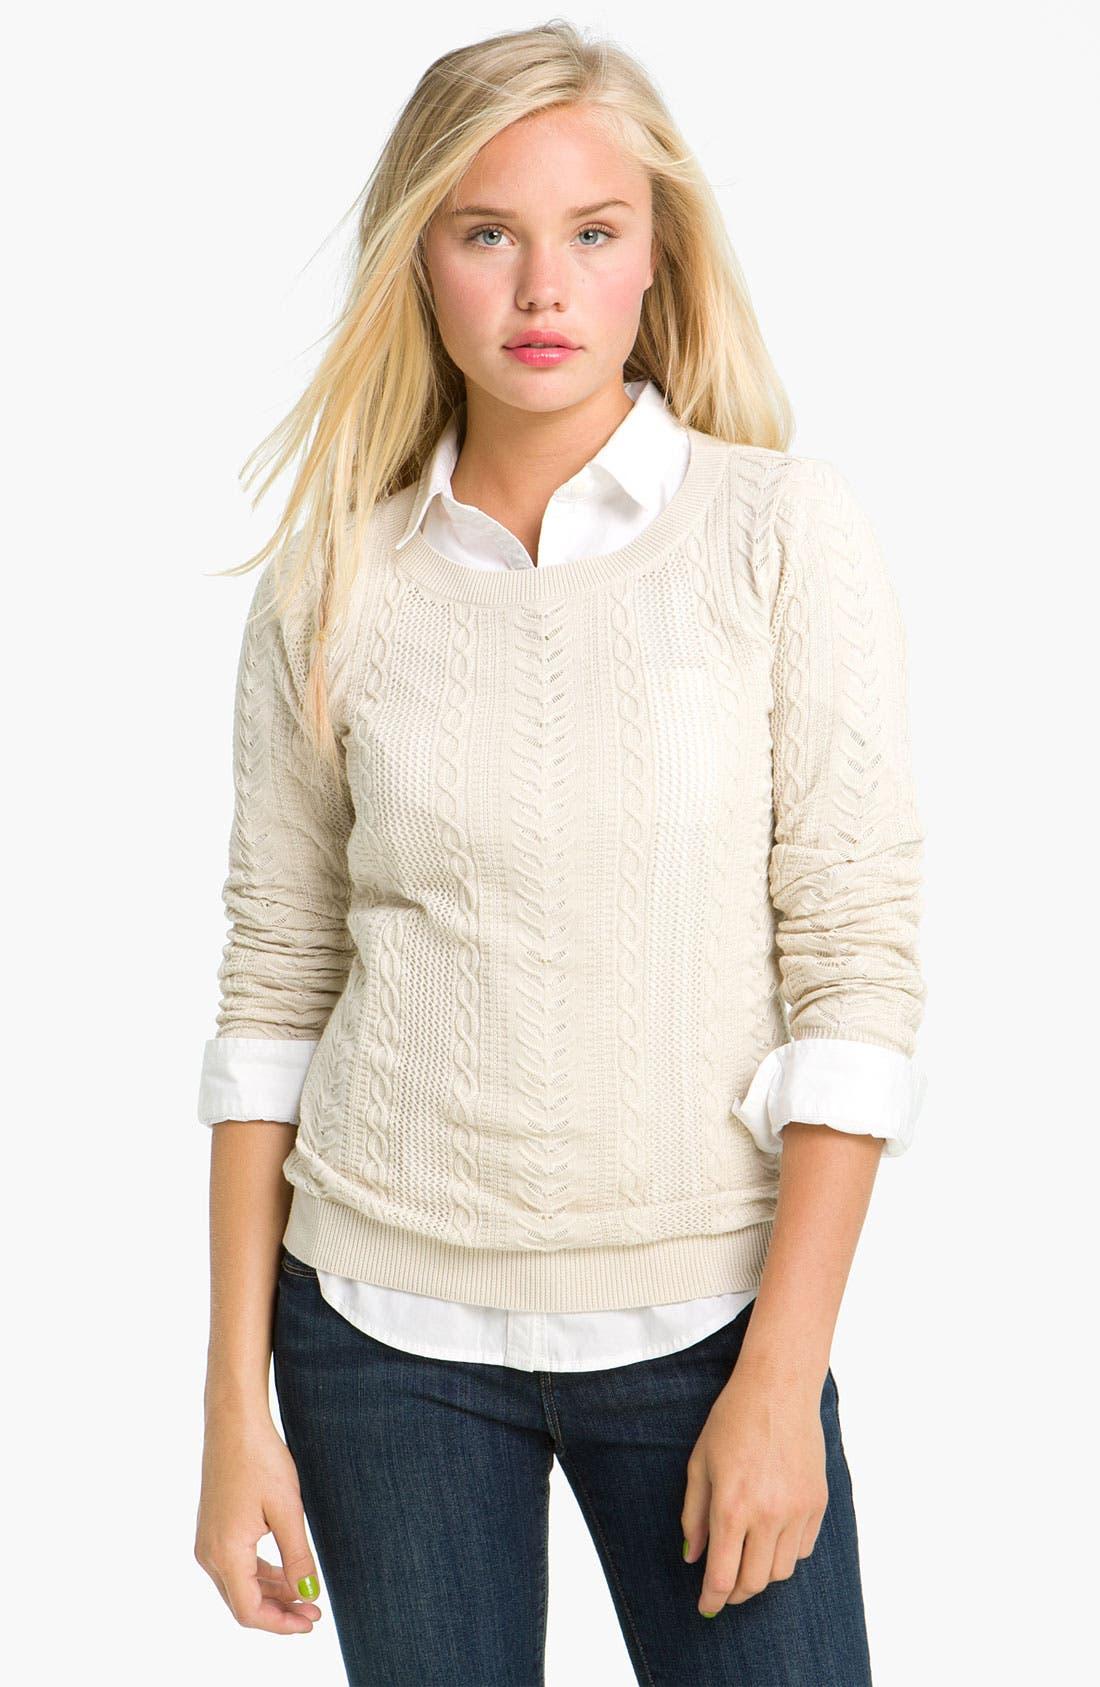 Main Image - BP. Sheer Cable Knit Sweater (Juniors)